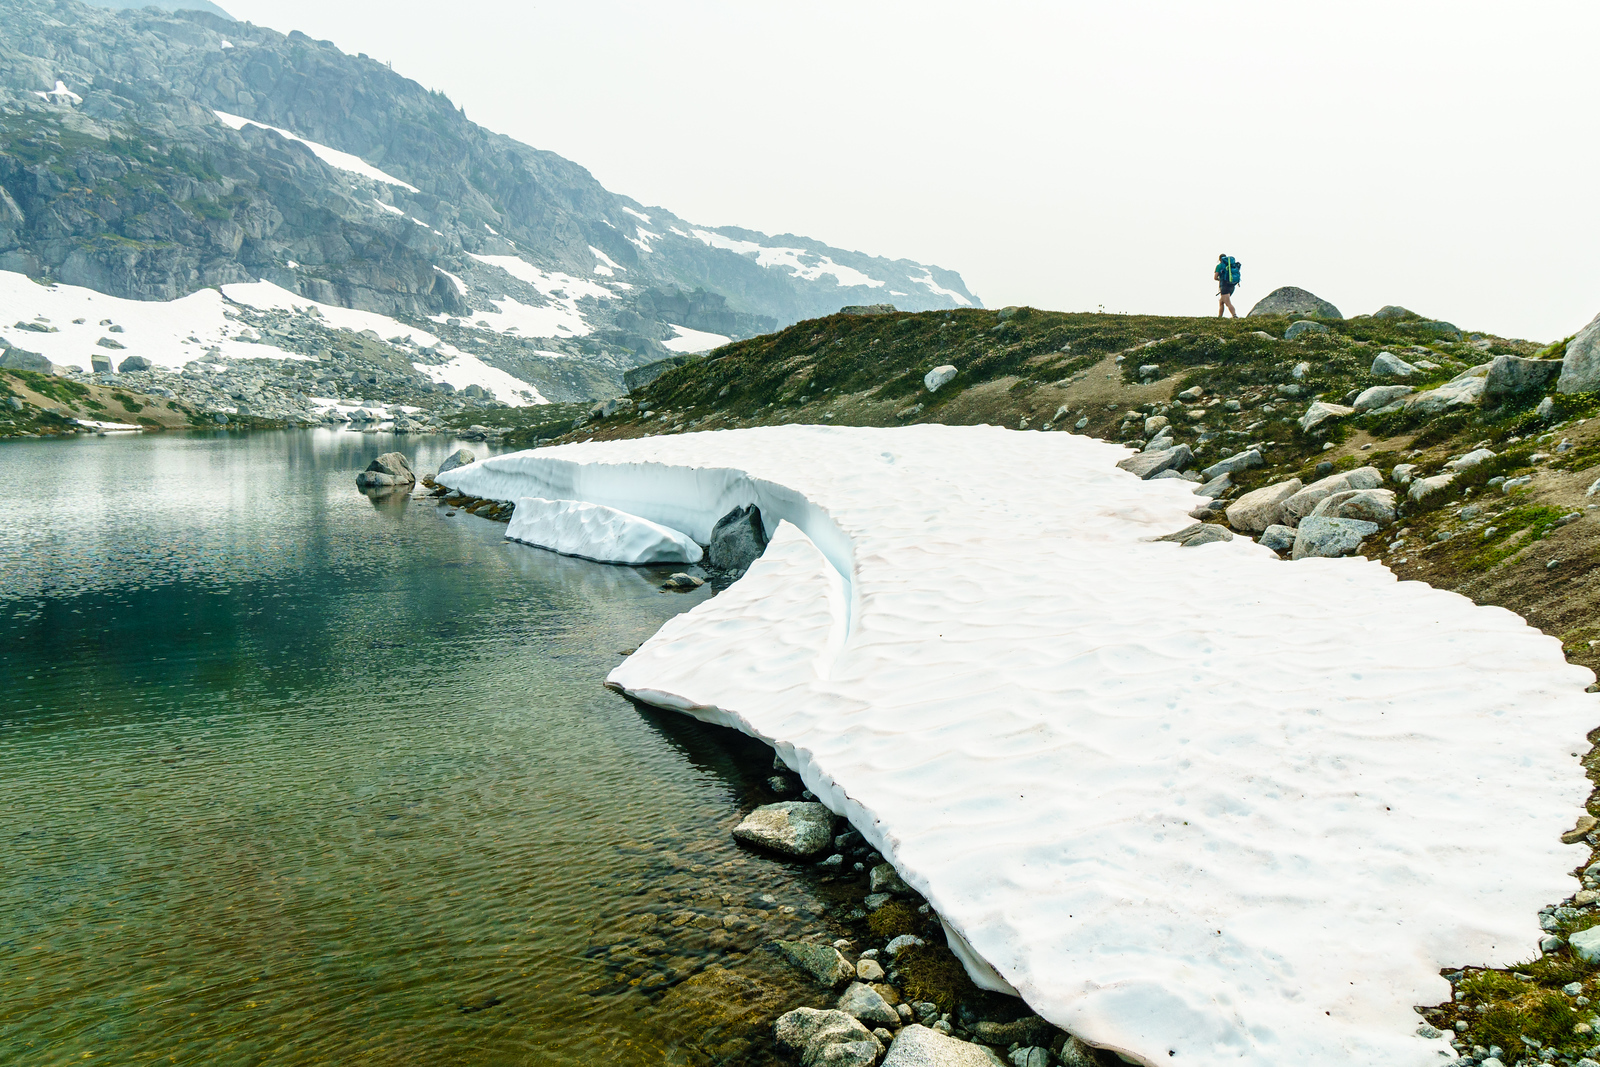 Lauren walks a trail near Heart Lake, high in the mountains above Pemberton, British Columbia.